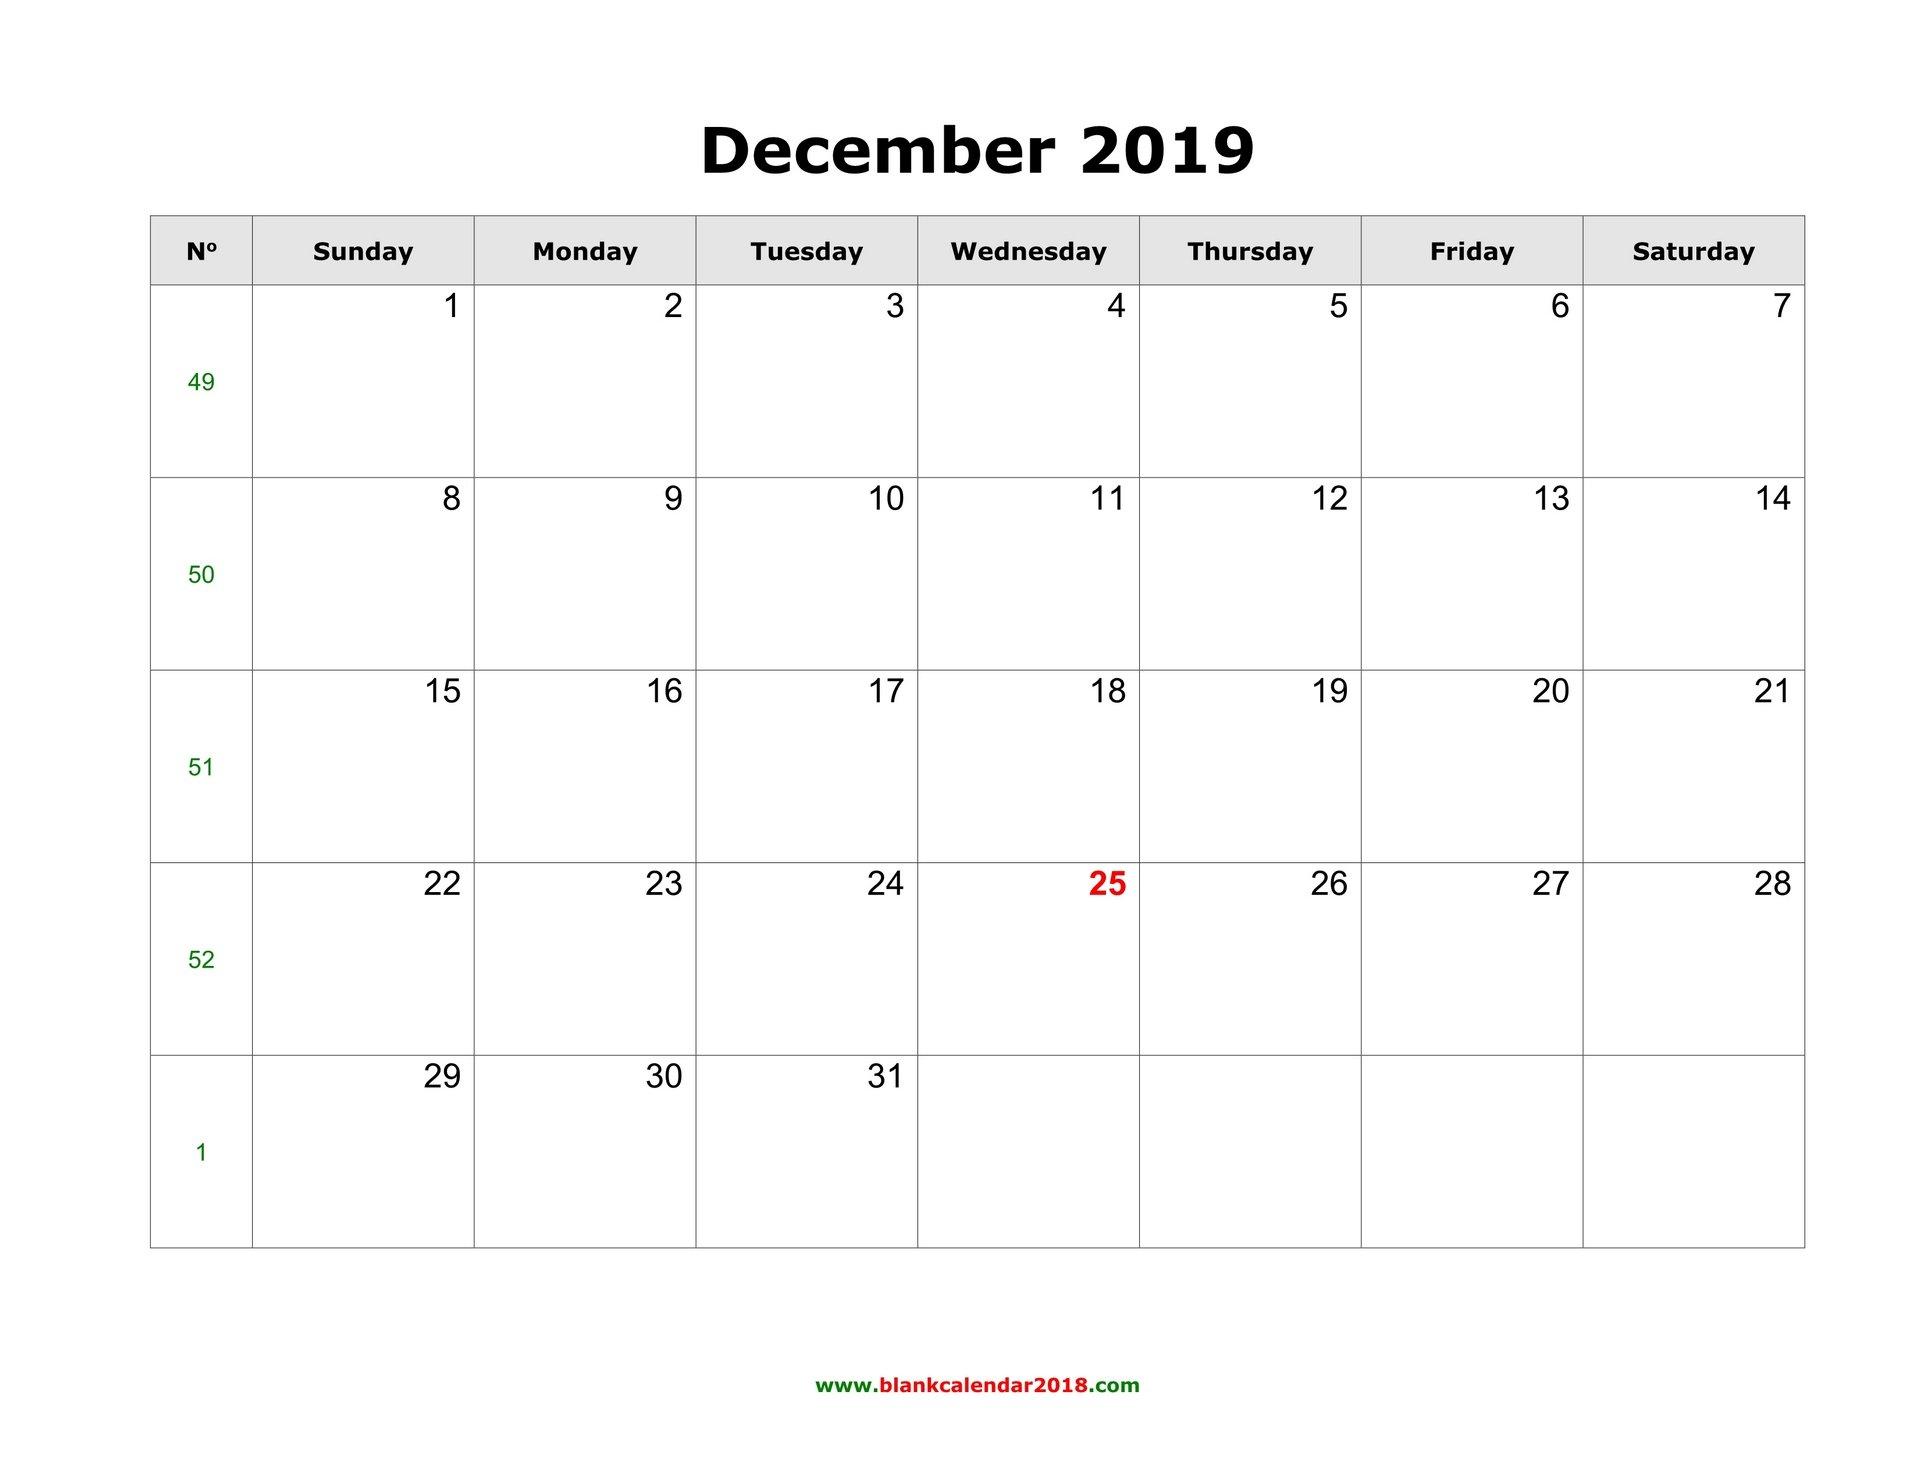 Blank Calendar For December 2019 Calendar 2019 December Printable